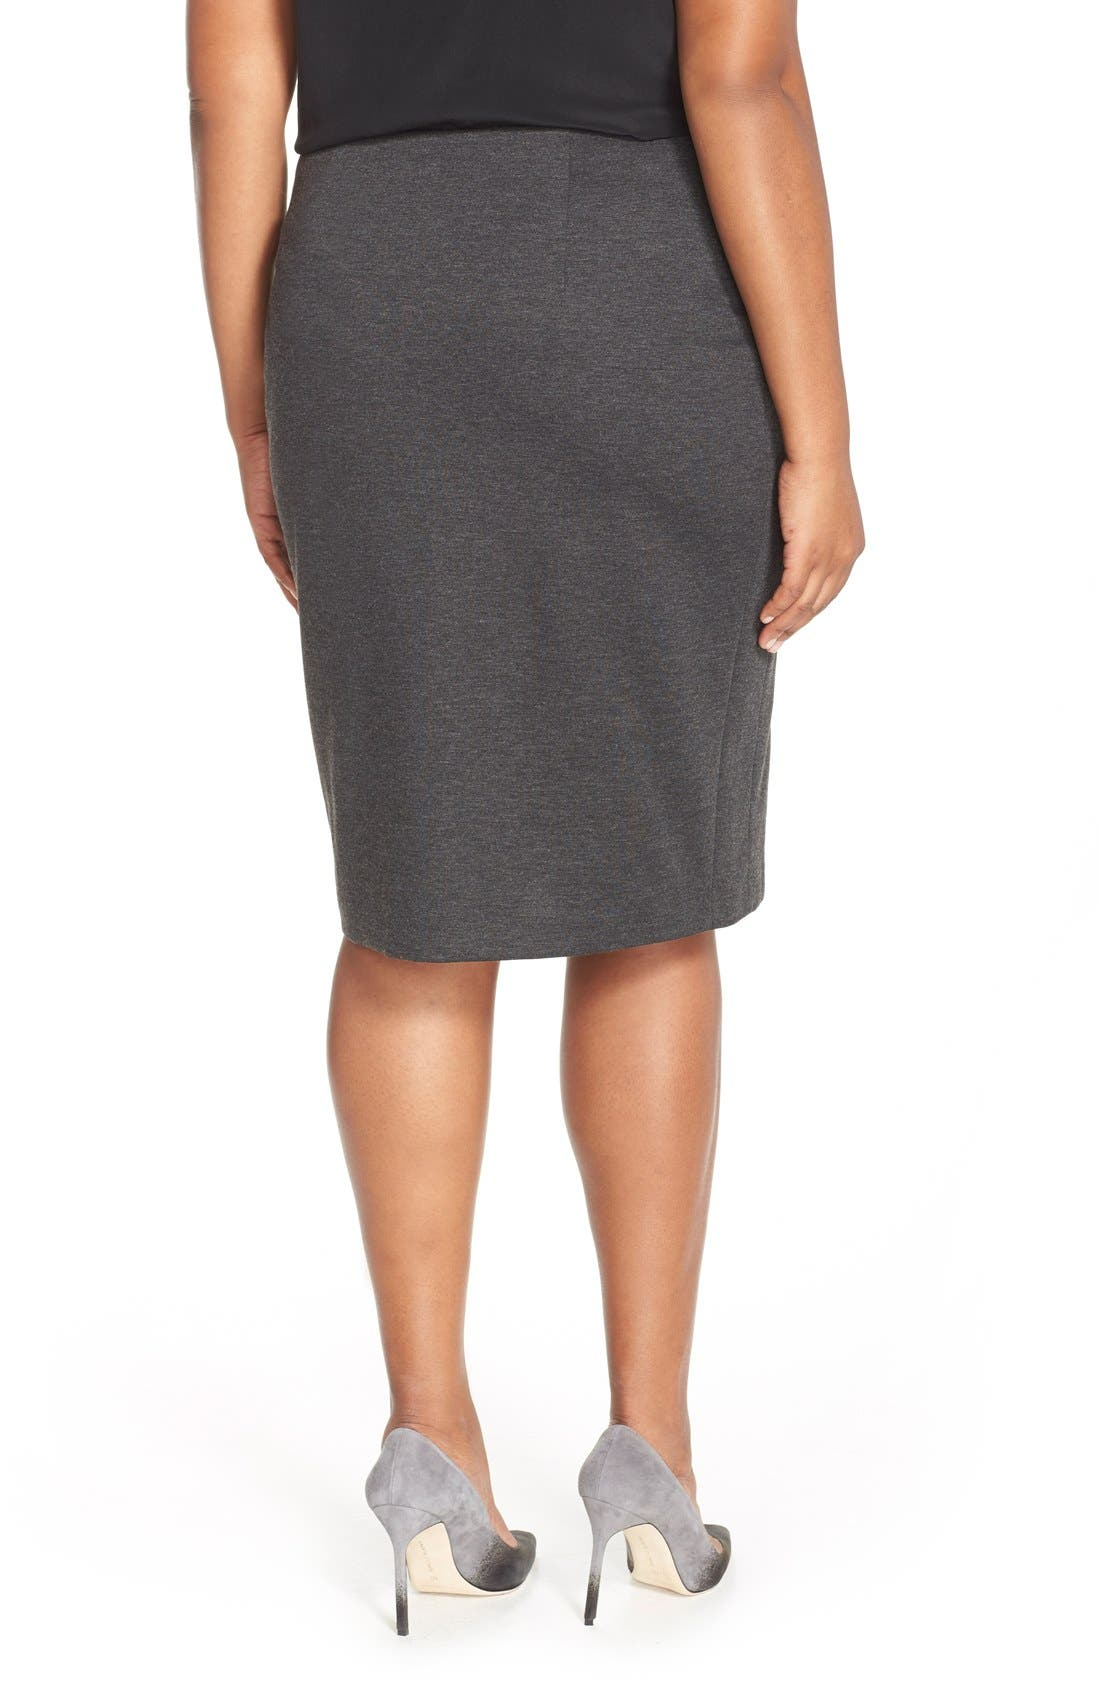 Alternate Image 2  - Vince Camuto Ponte Knit Skirt (Plus Size)